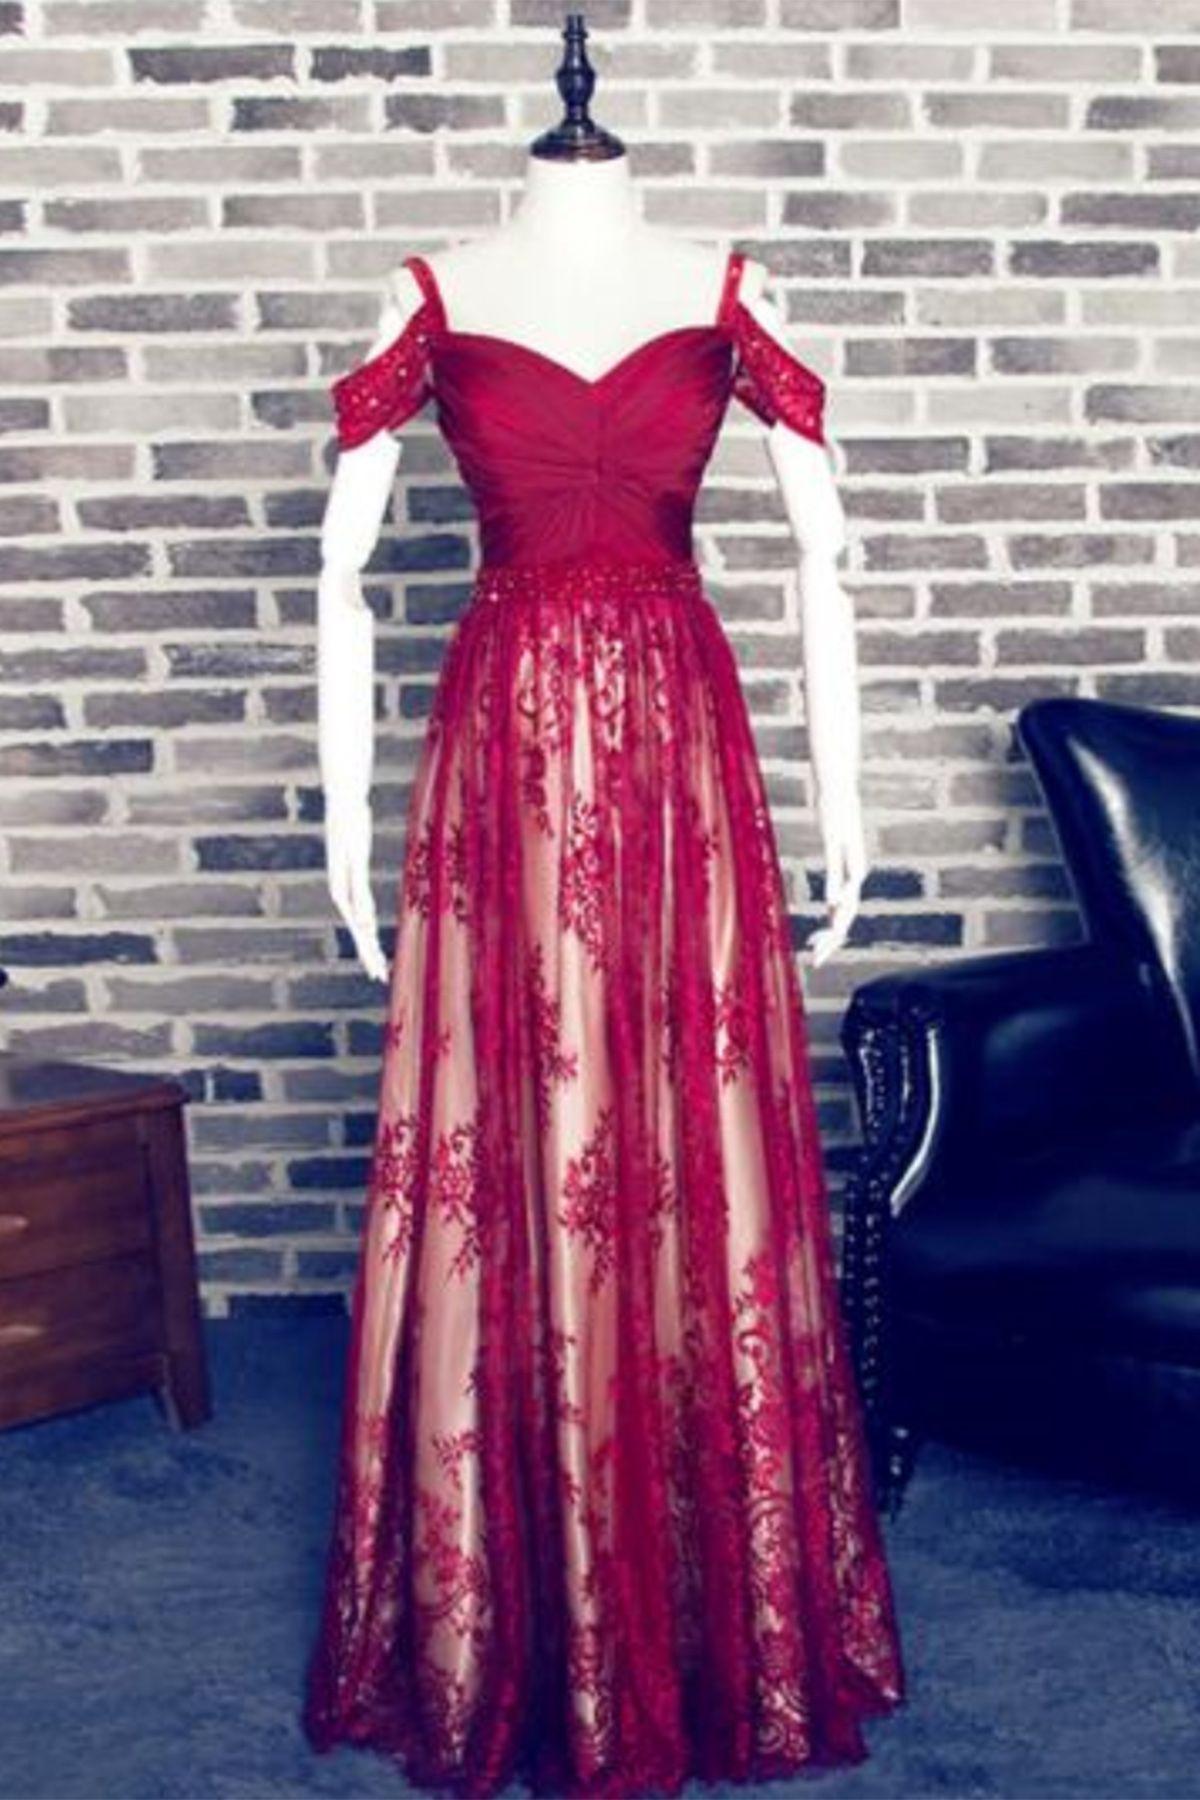 Off shoulder prom dresses new unique design burgundy lace